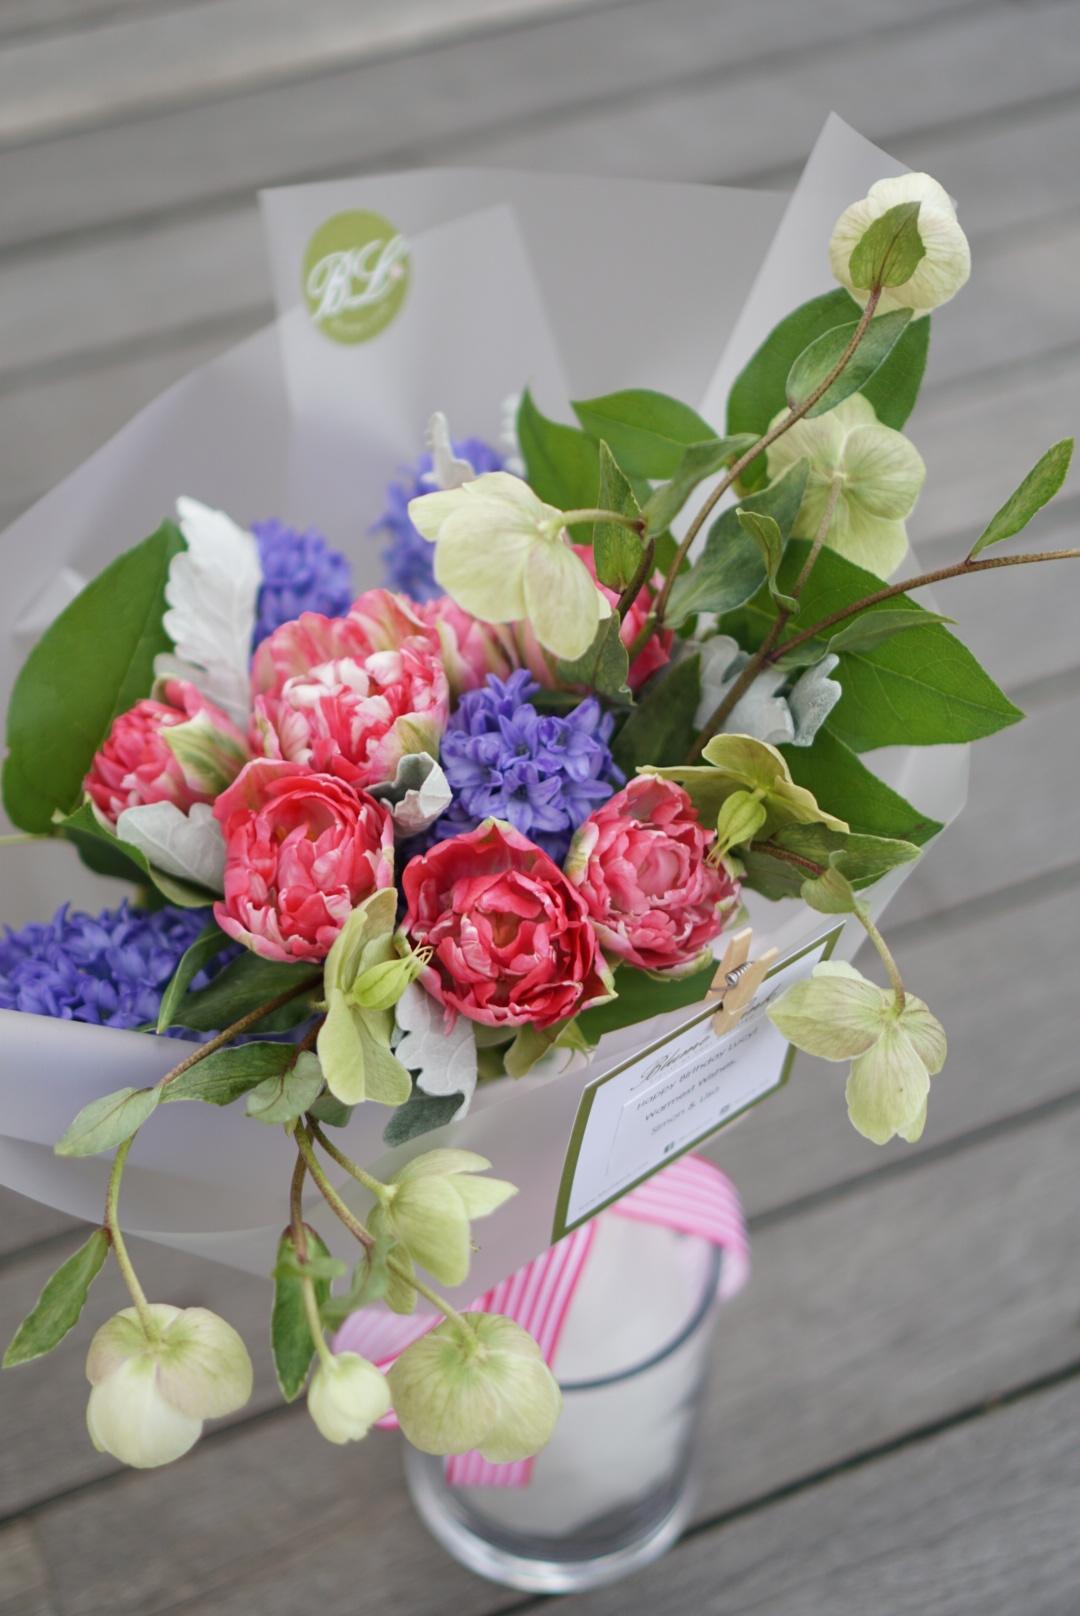 Double petal tulips & hyacint bouquet.JPG